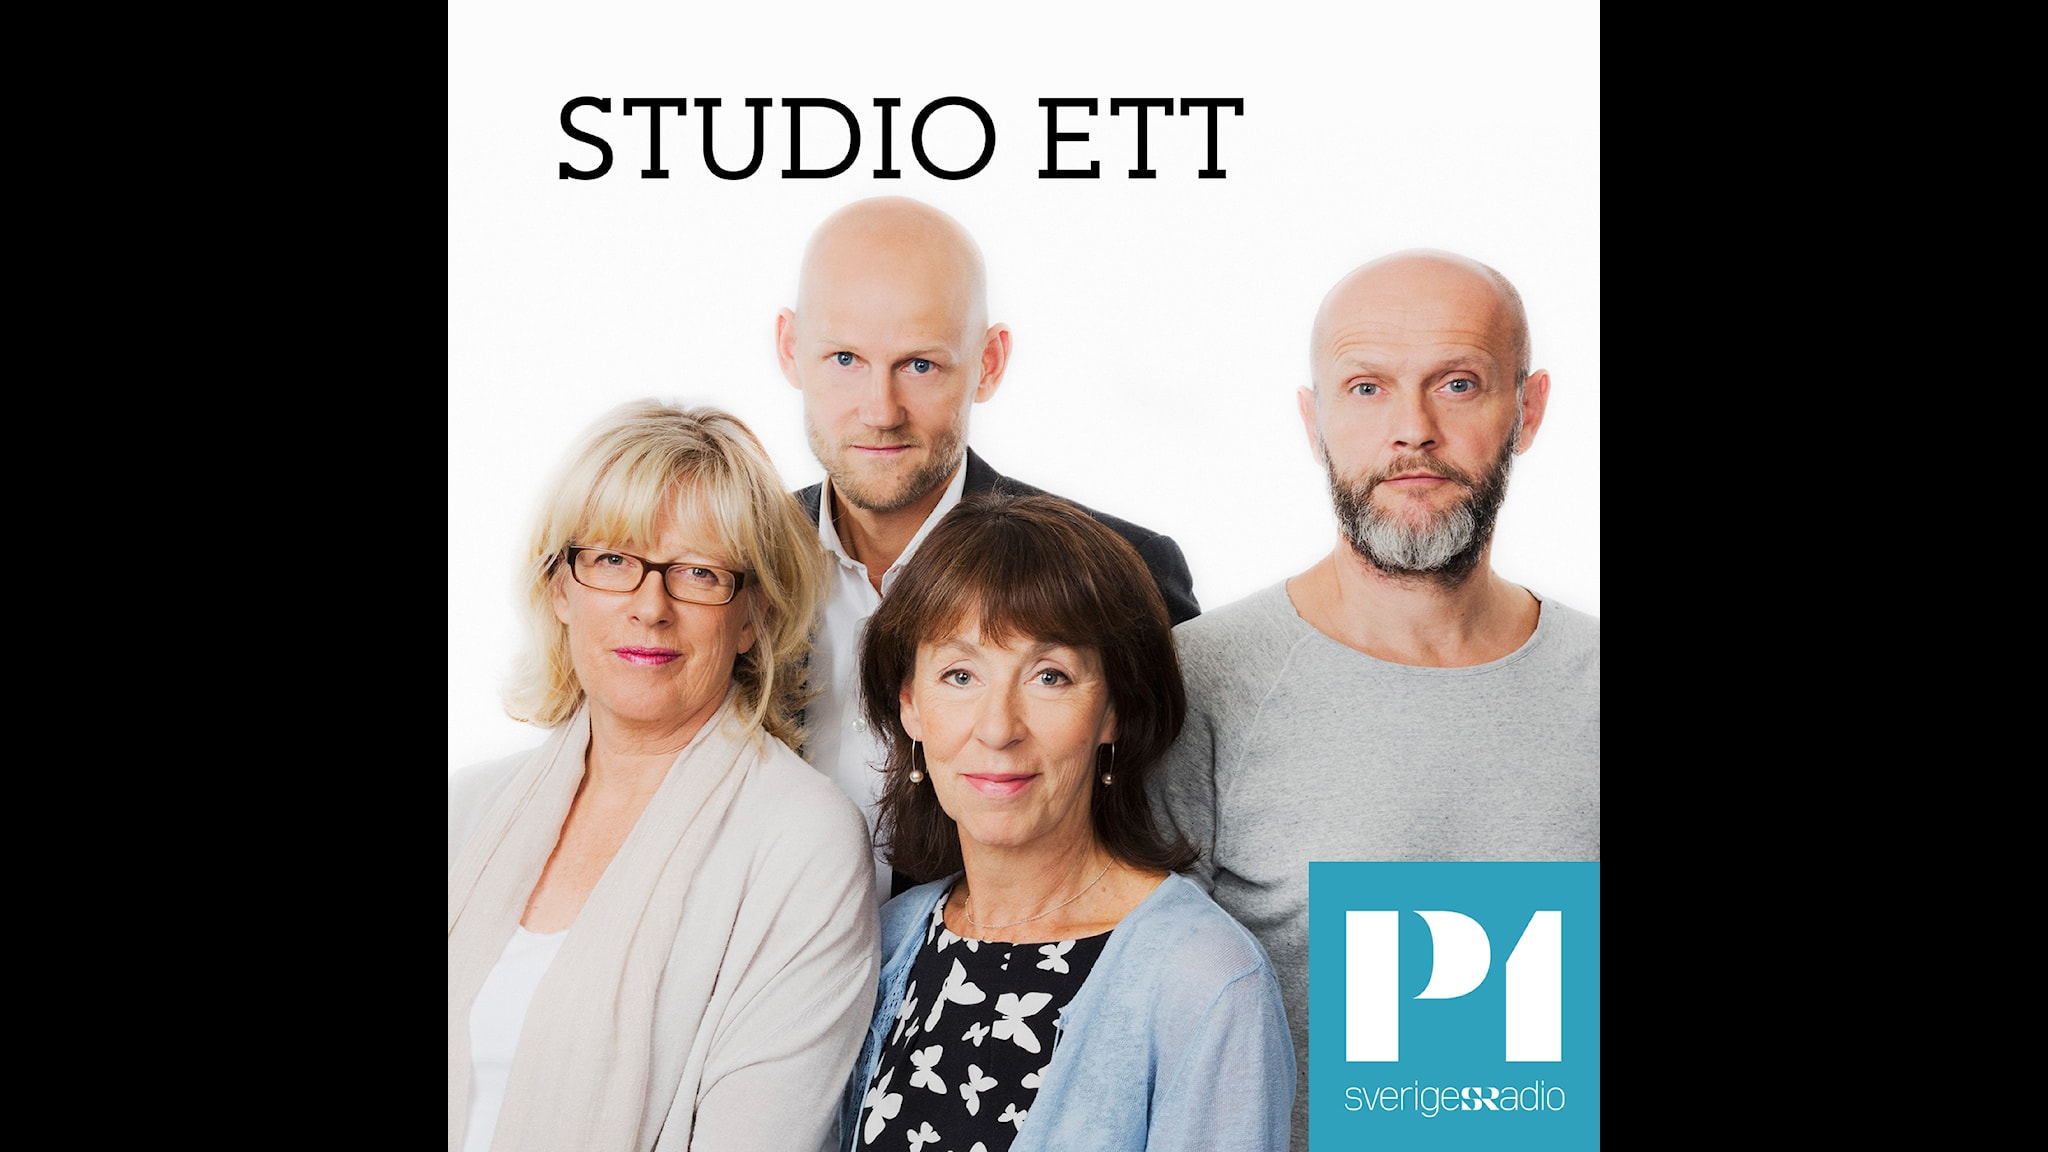 Studio Ett 29 mars